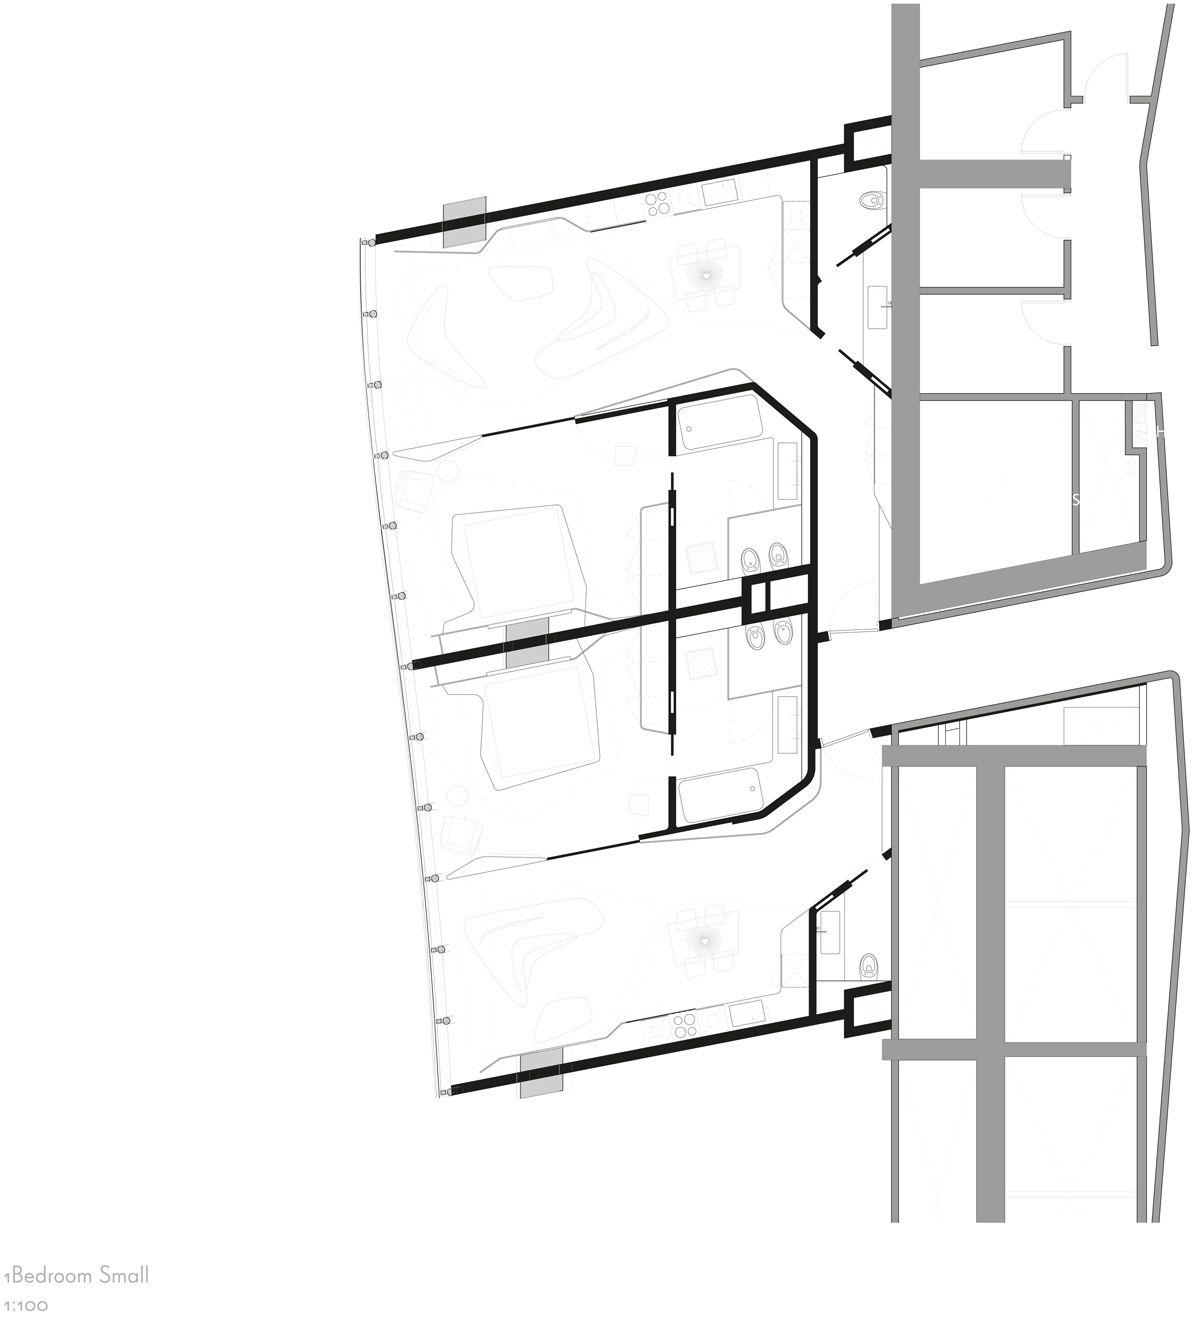 Zaha hadid designs interiors for dubais opus office tower archi zaha hadid designs interiors for dubais opus office tower archi pinterest zaha hadid design zaha hadid and tower ccuart Images